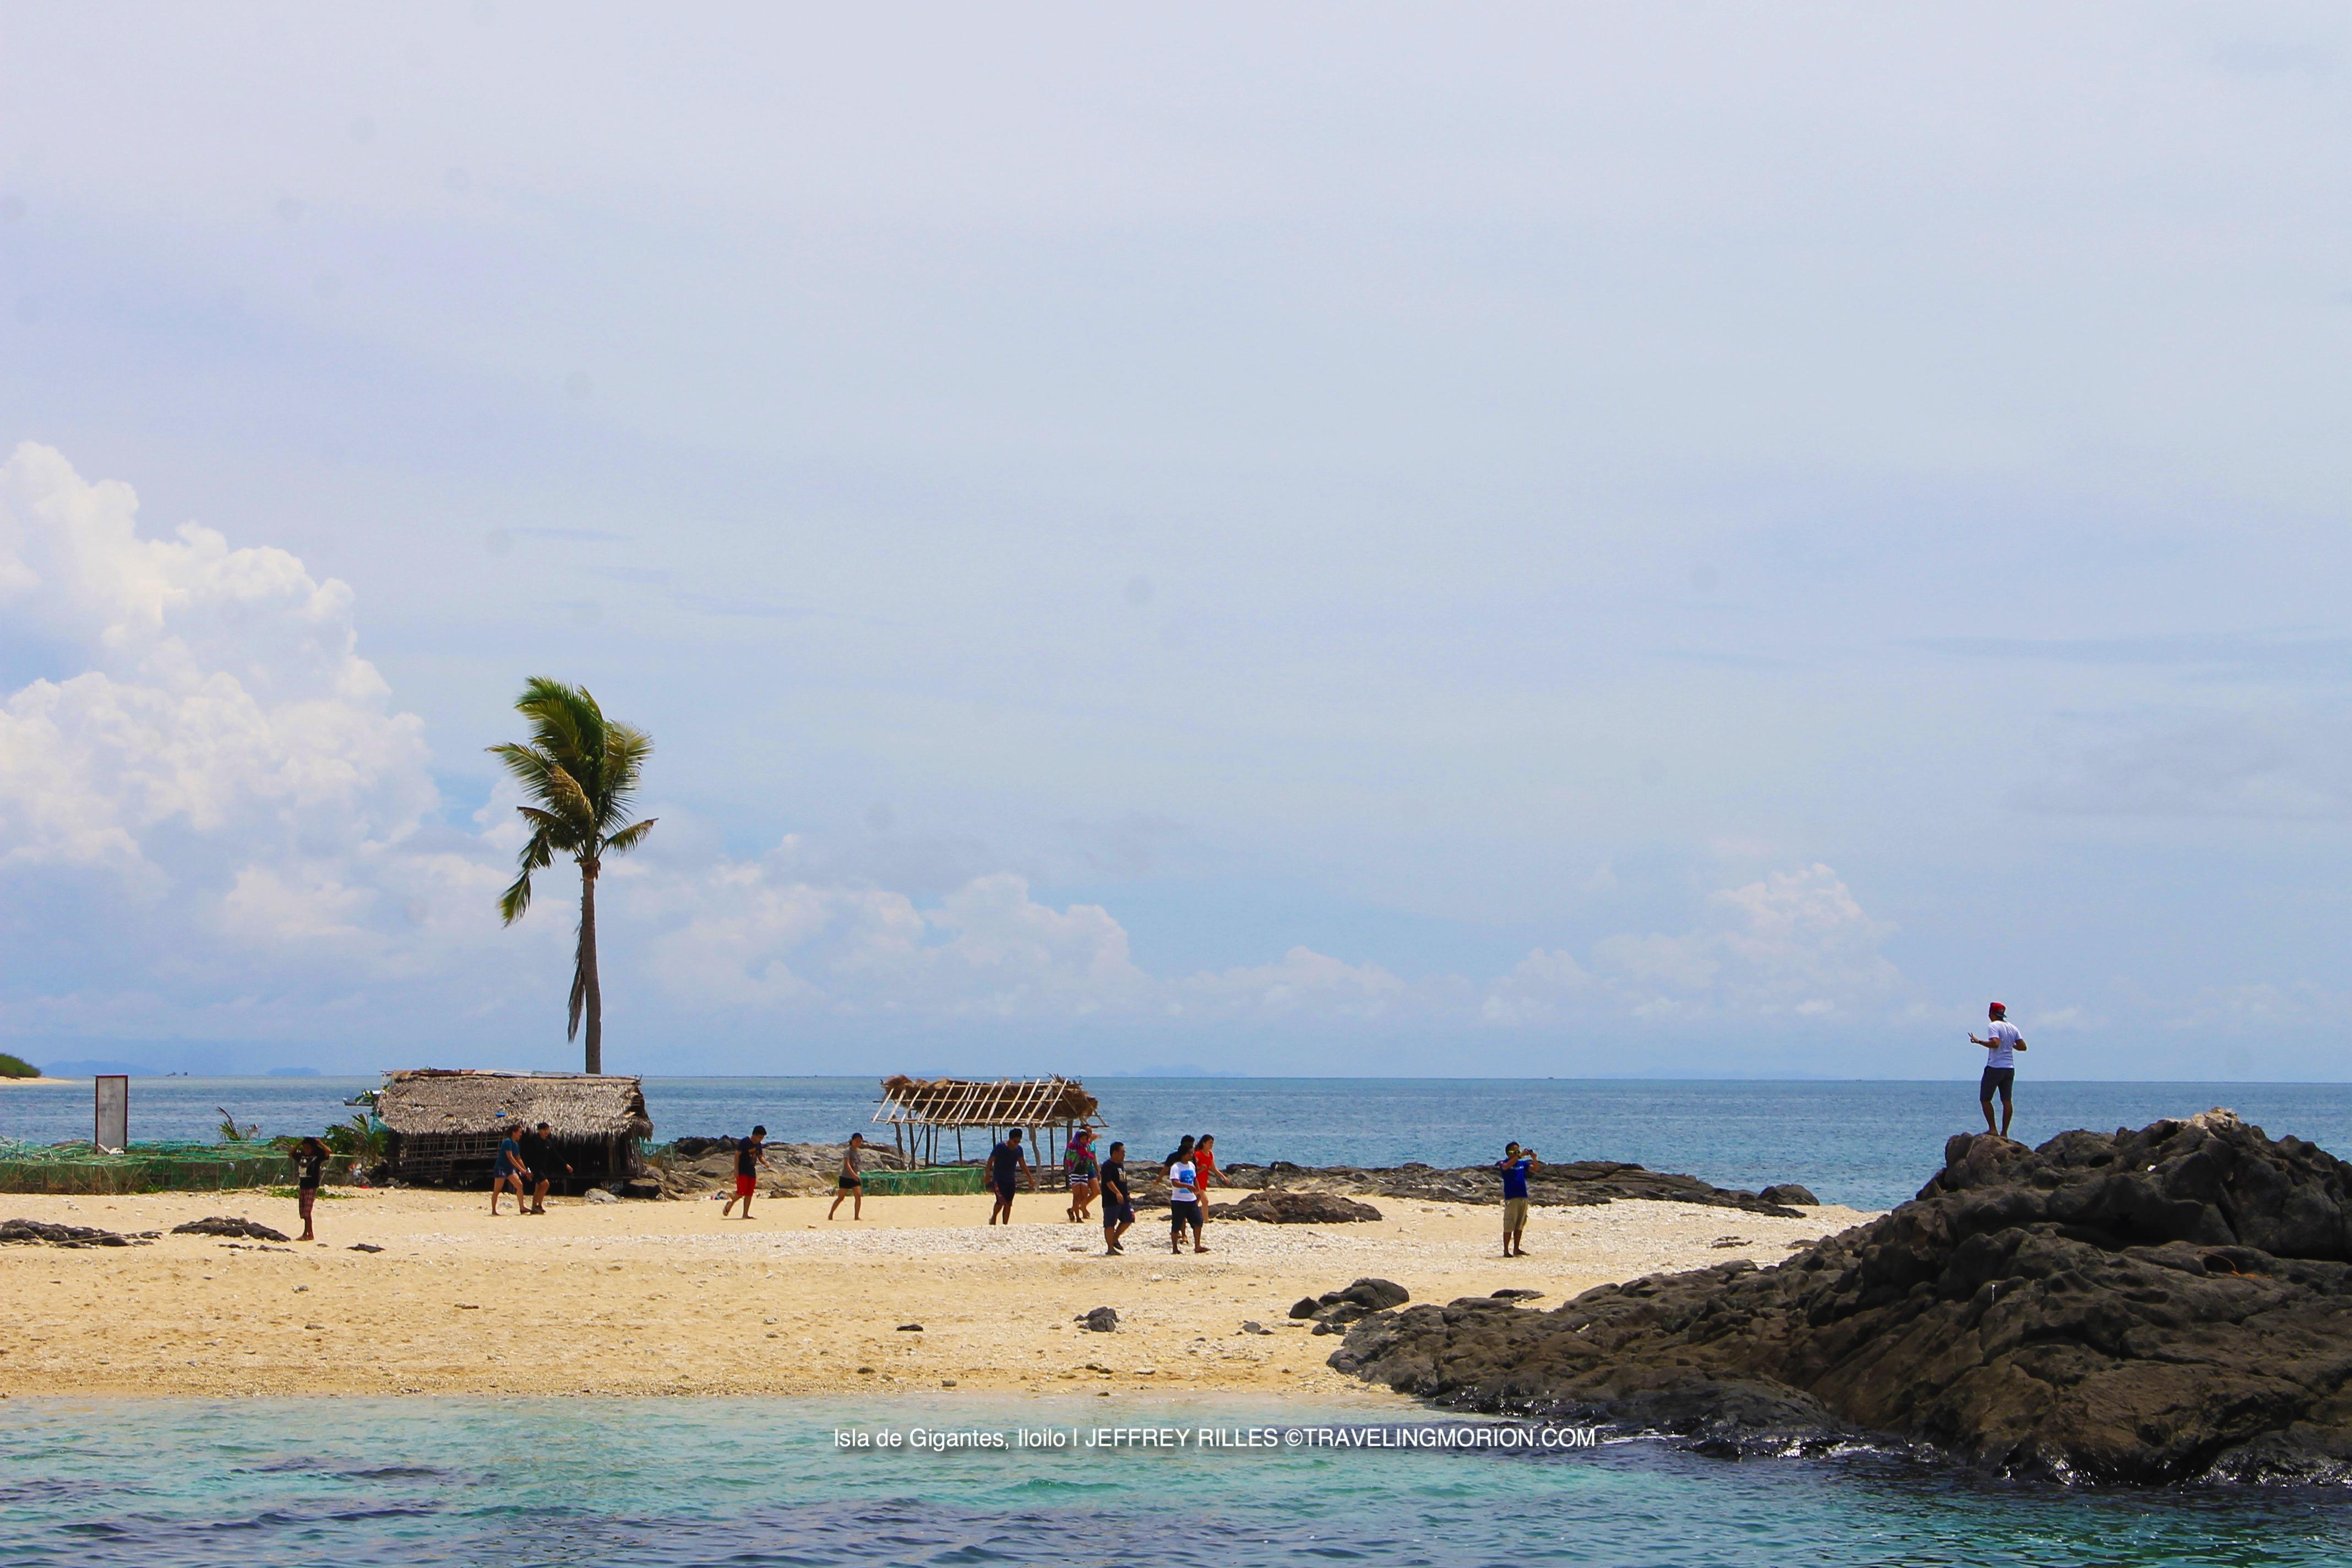 Pulupandan Islet, Islas de Gigantes